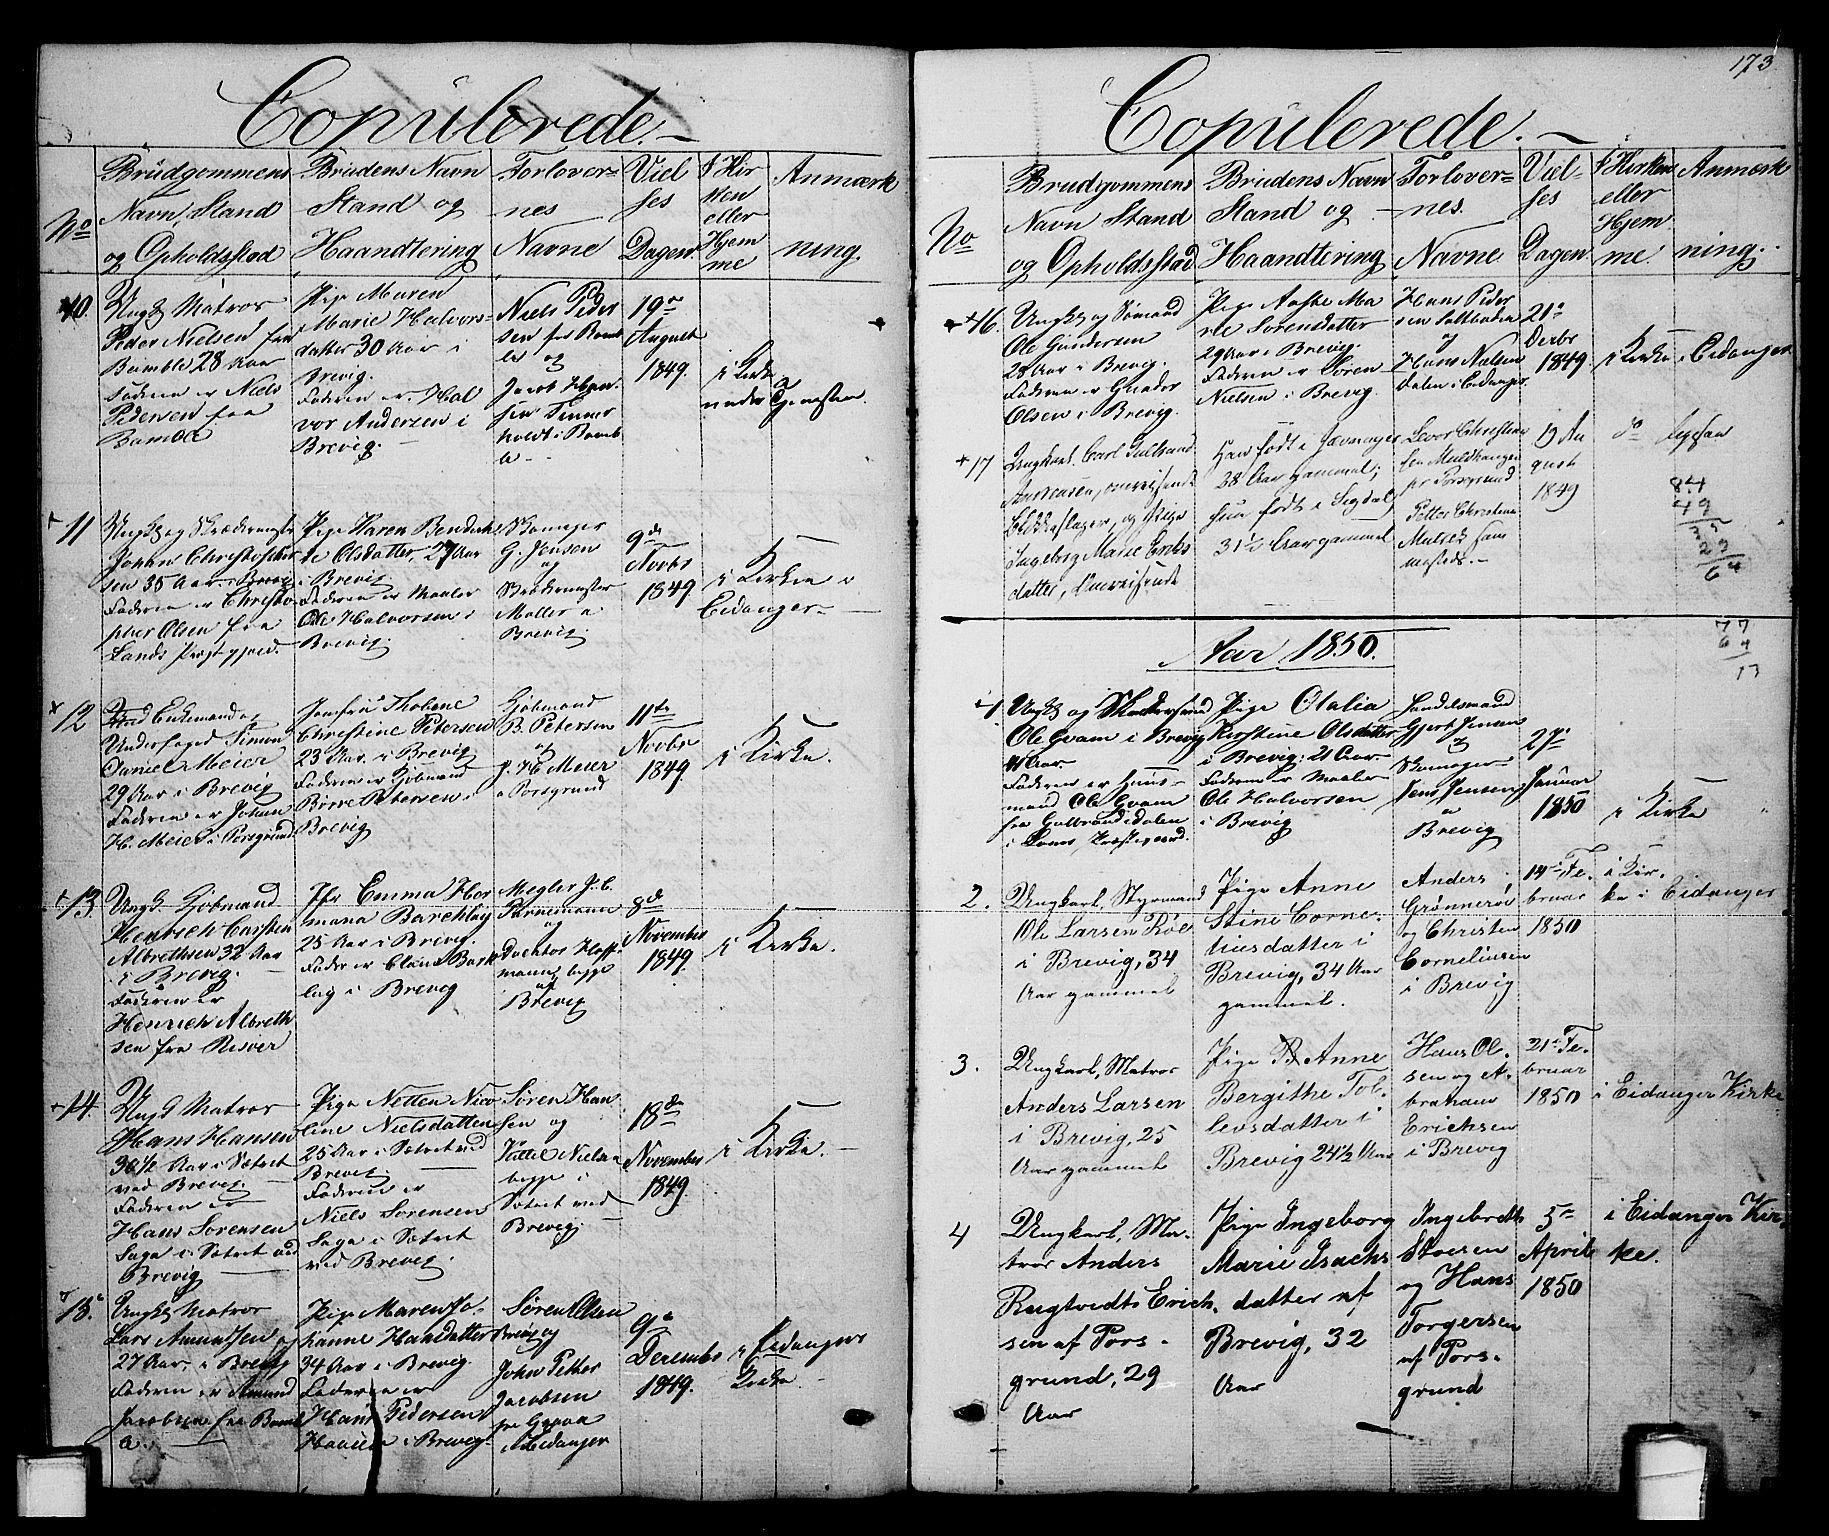 SAKO, Brevik kirkebøker, G/Ga/L0002: Klokkerbok nr. 2, 1846-1865, s. 173